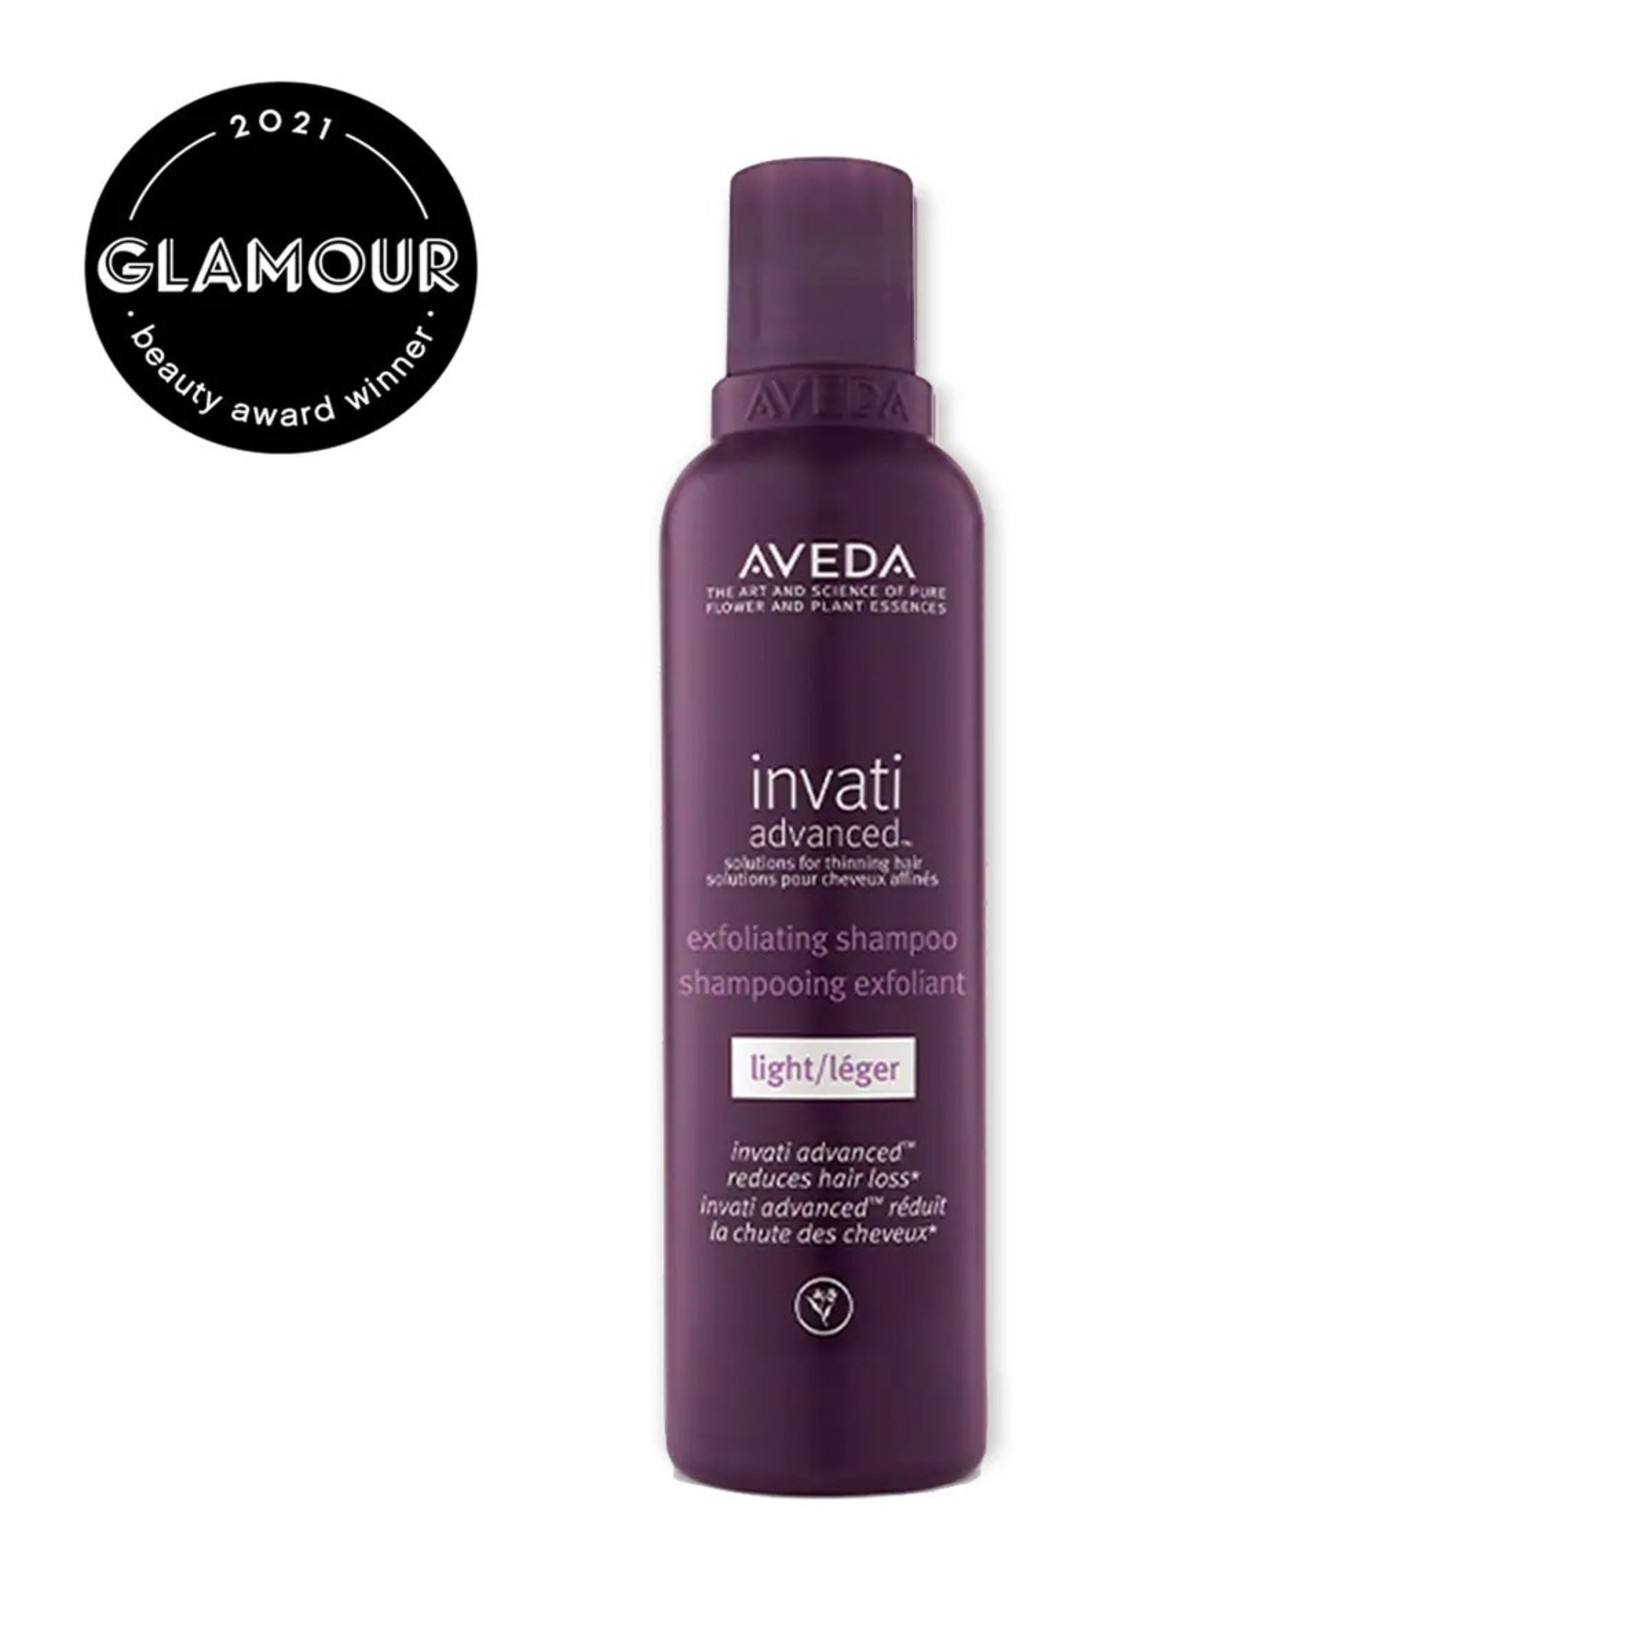 AVEDA Invati Advanced™ Exfoliating Shampoo Light